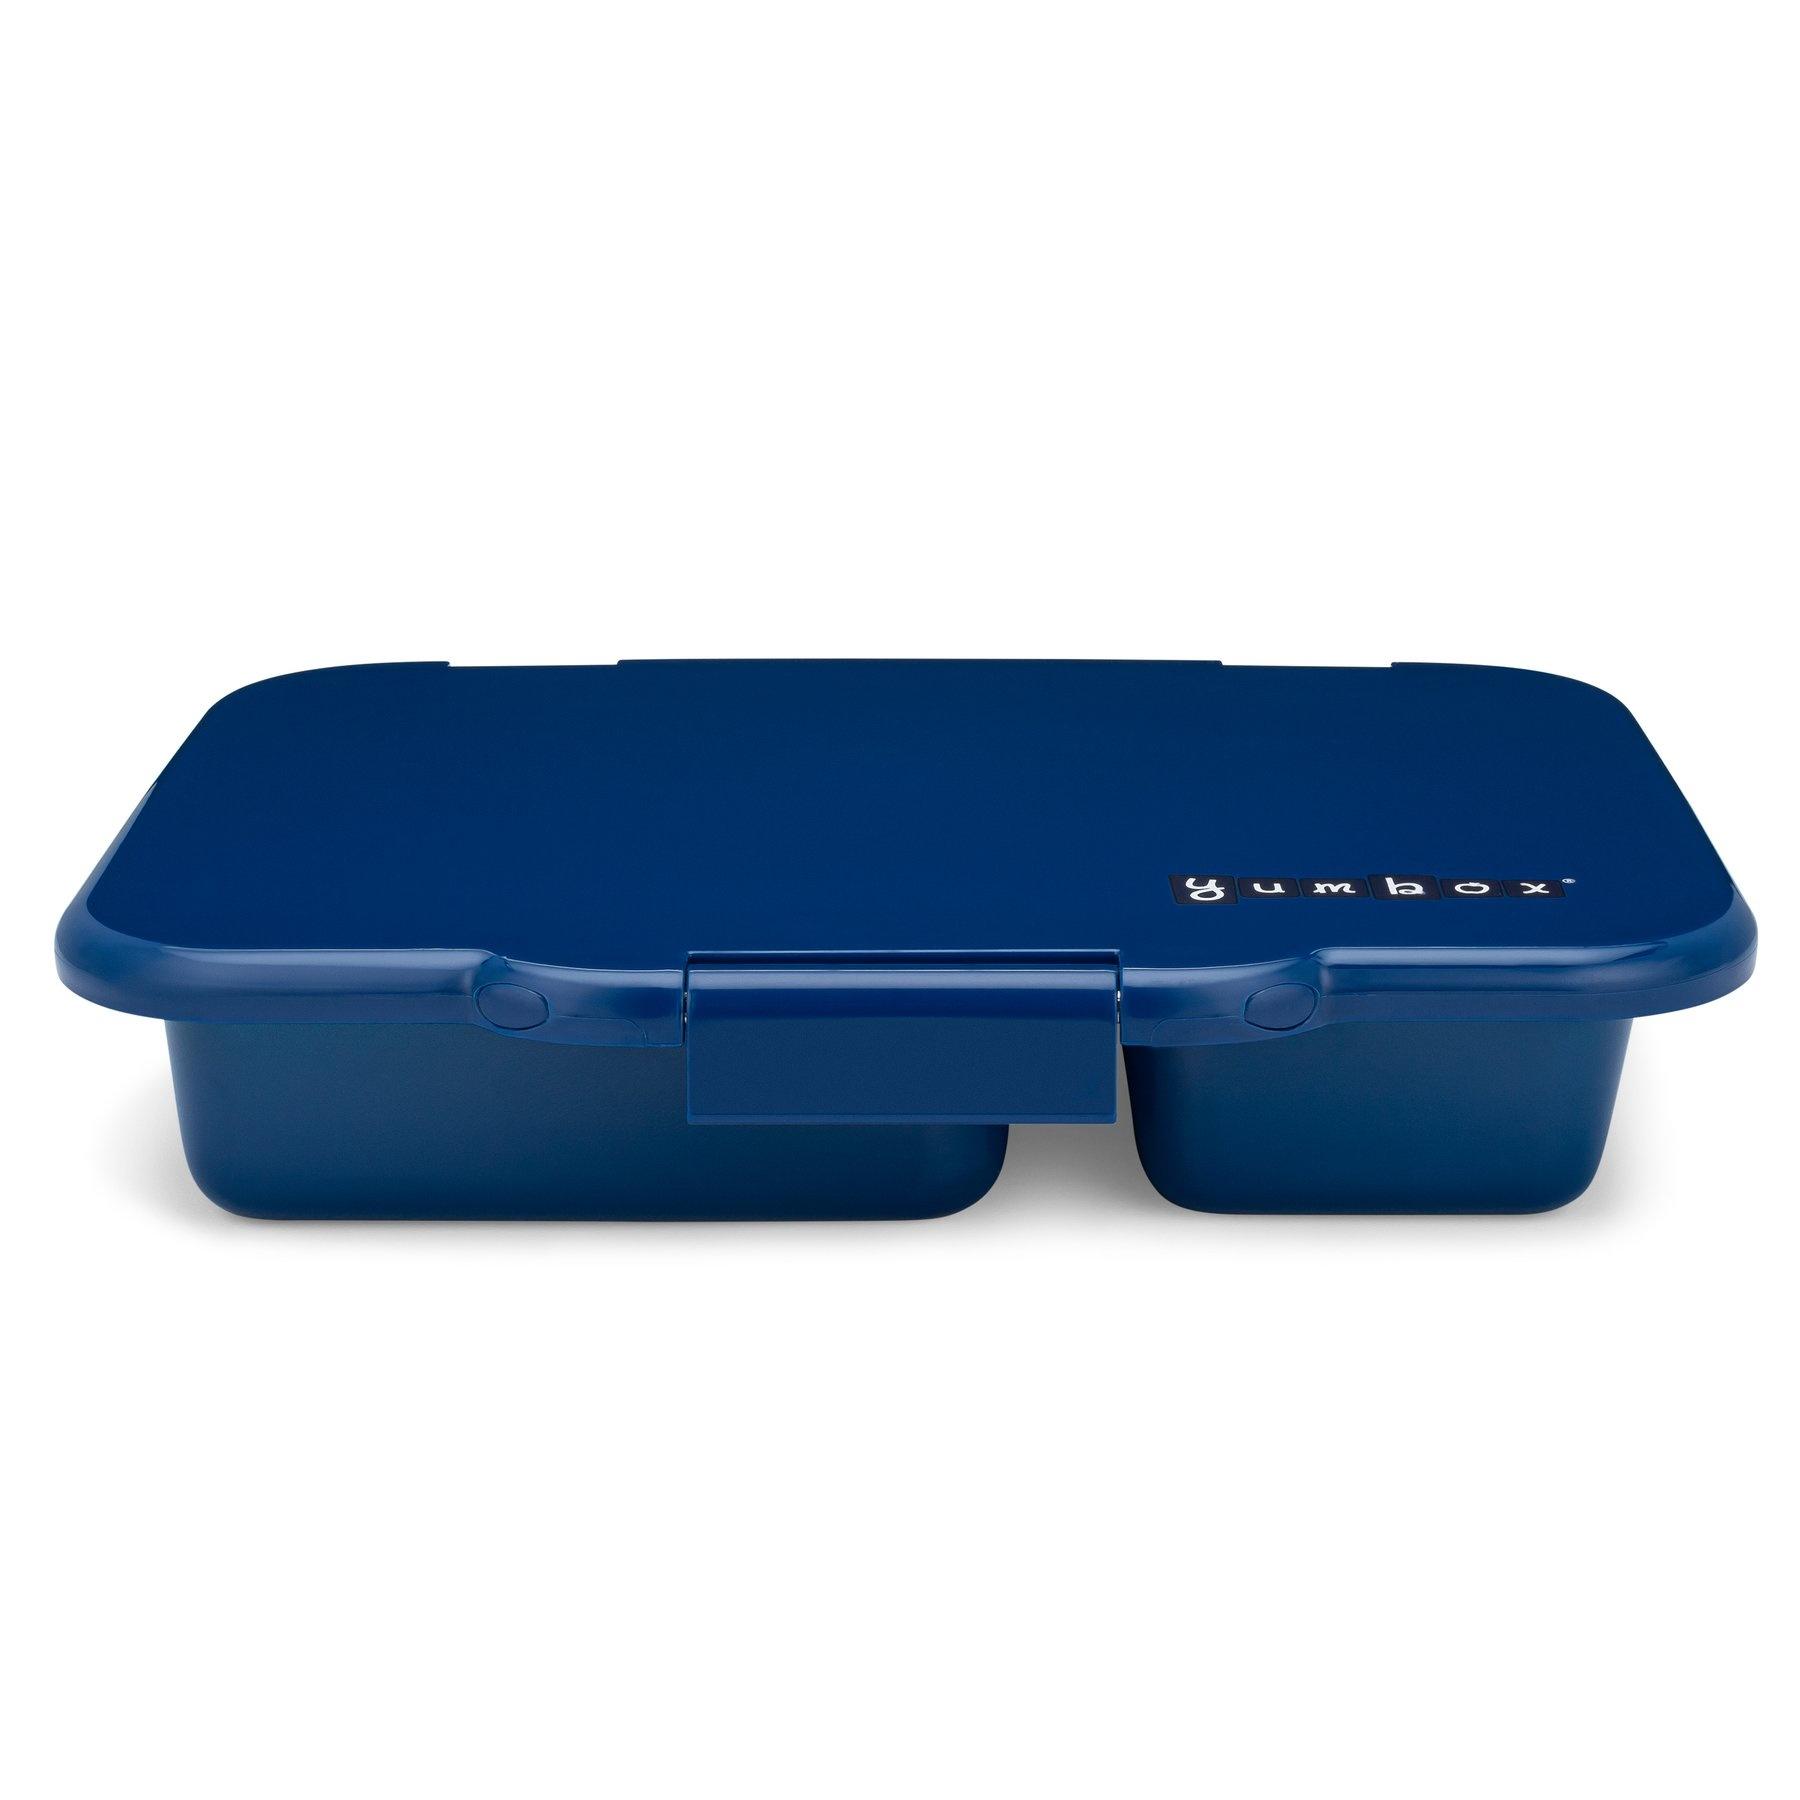 Stainless steel Bento Box with ceramic tray - Santa Fe blue-3